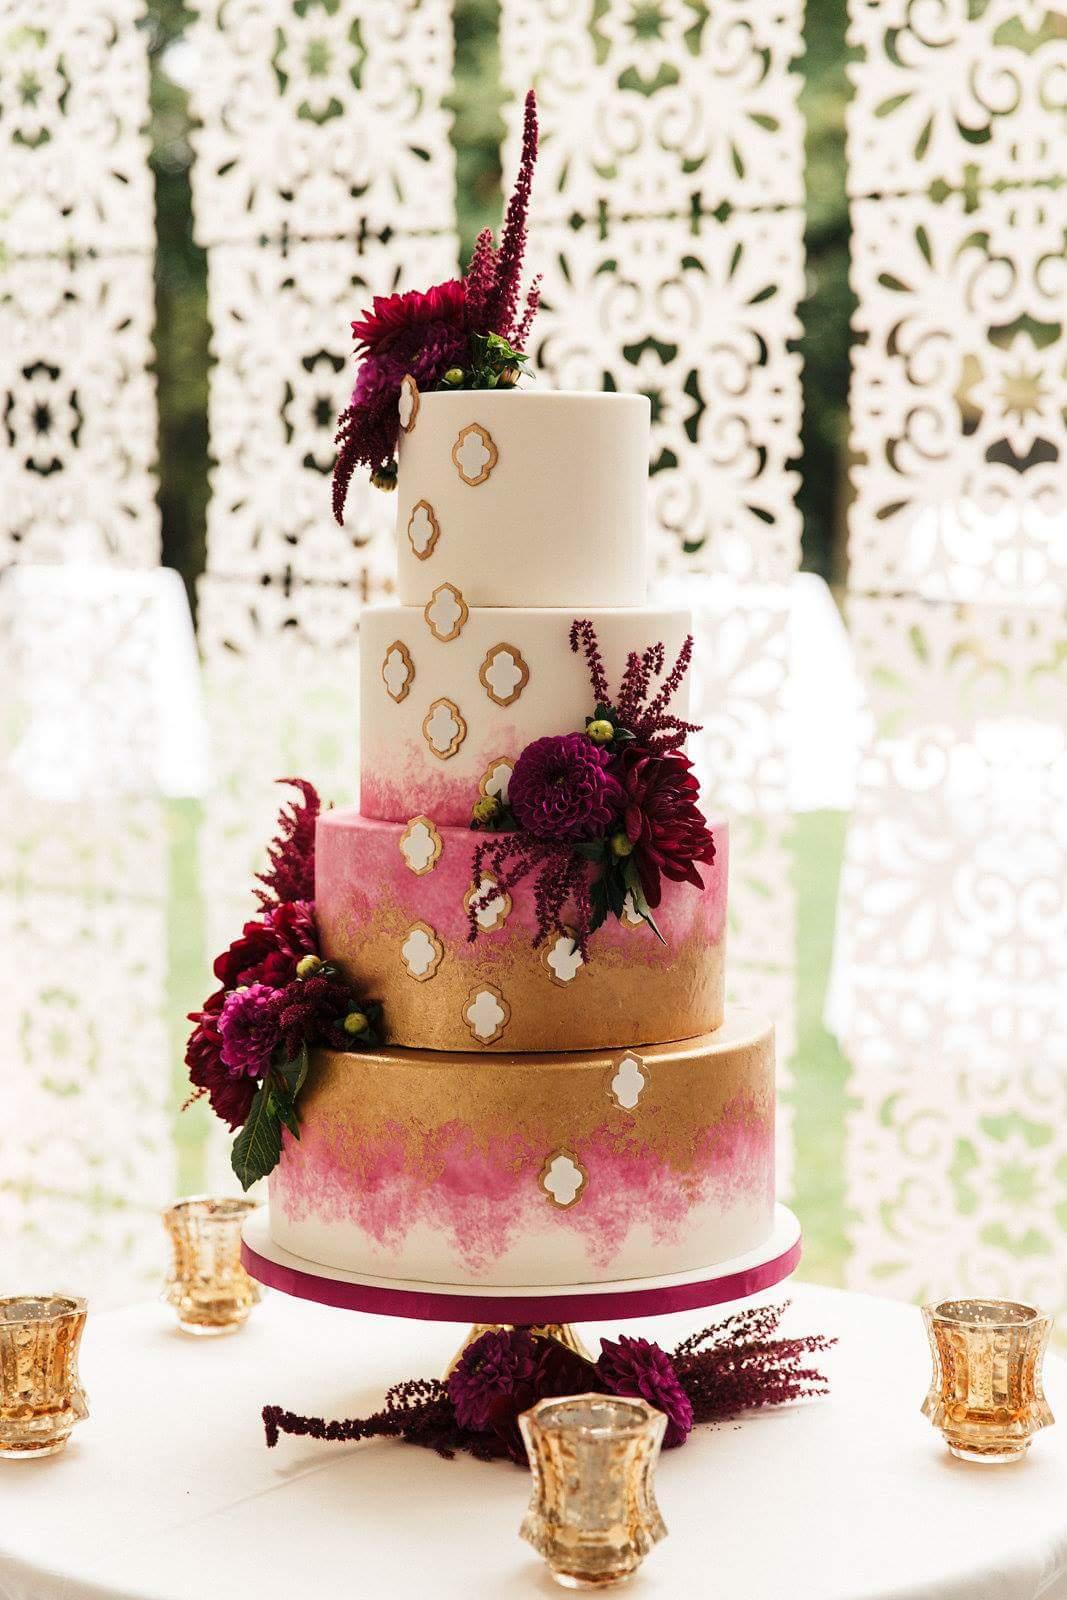 The Cake And The Giraffe Montecristo